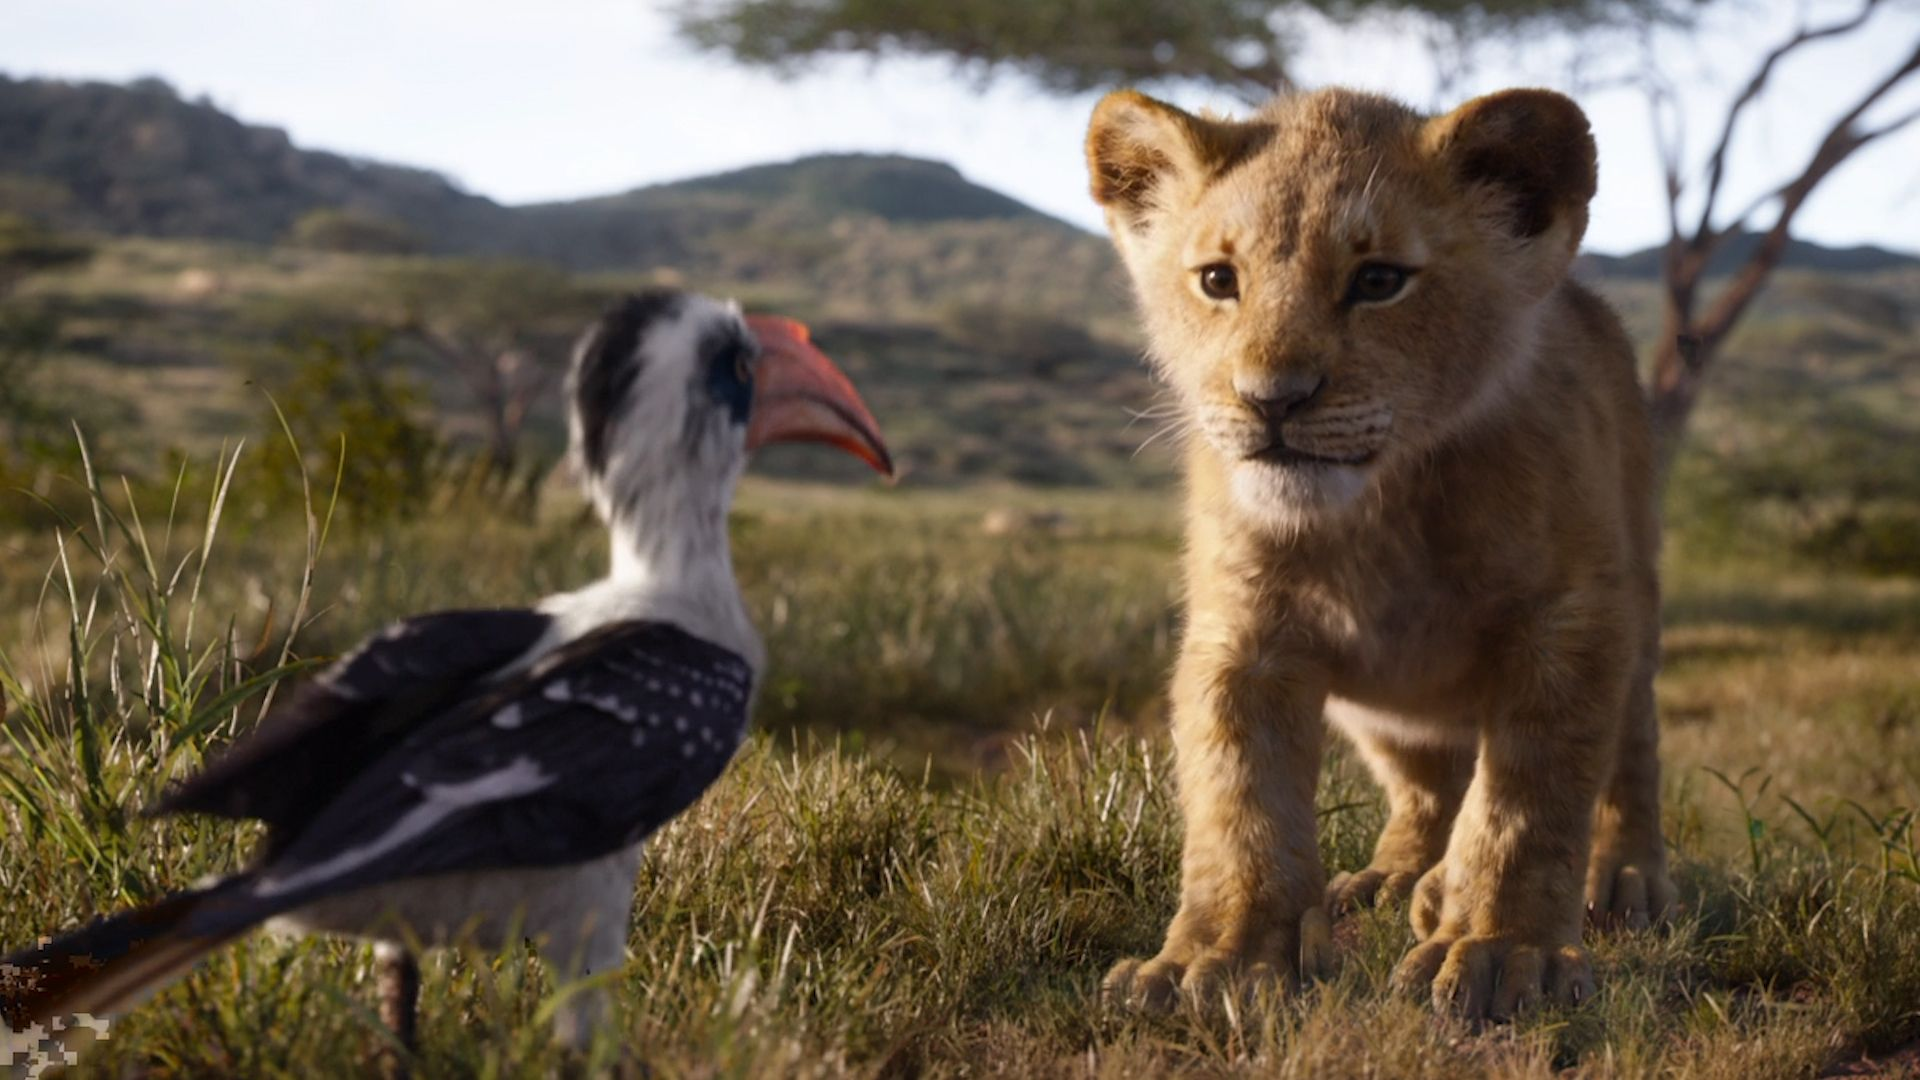 u2018the lion king u2019 is not a shot